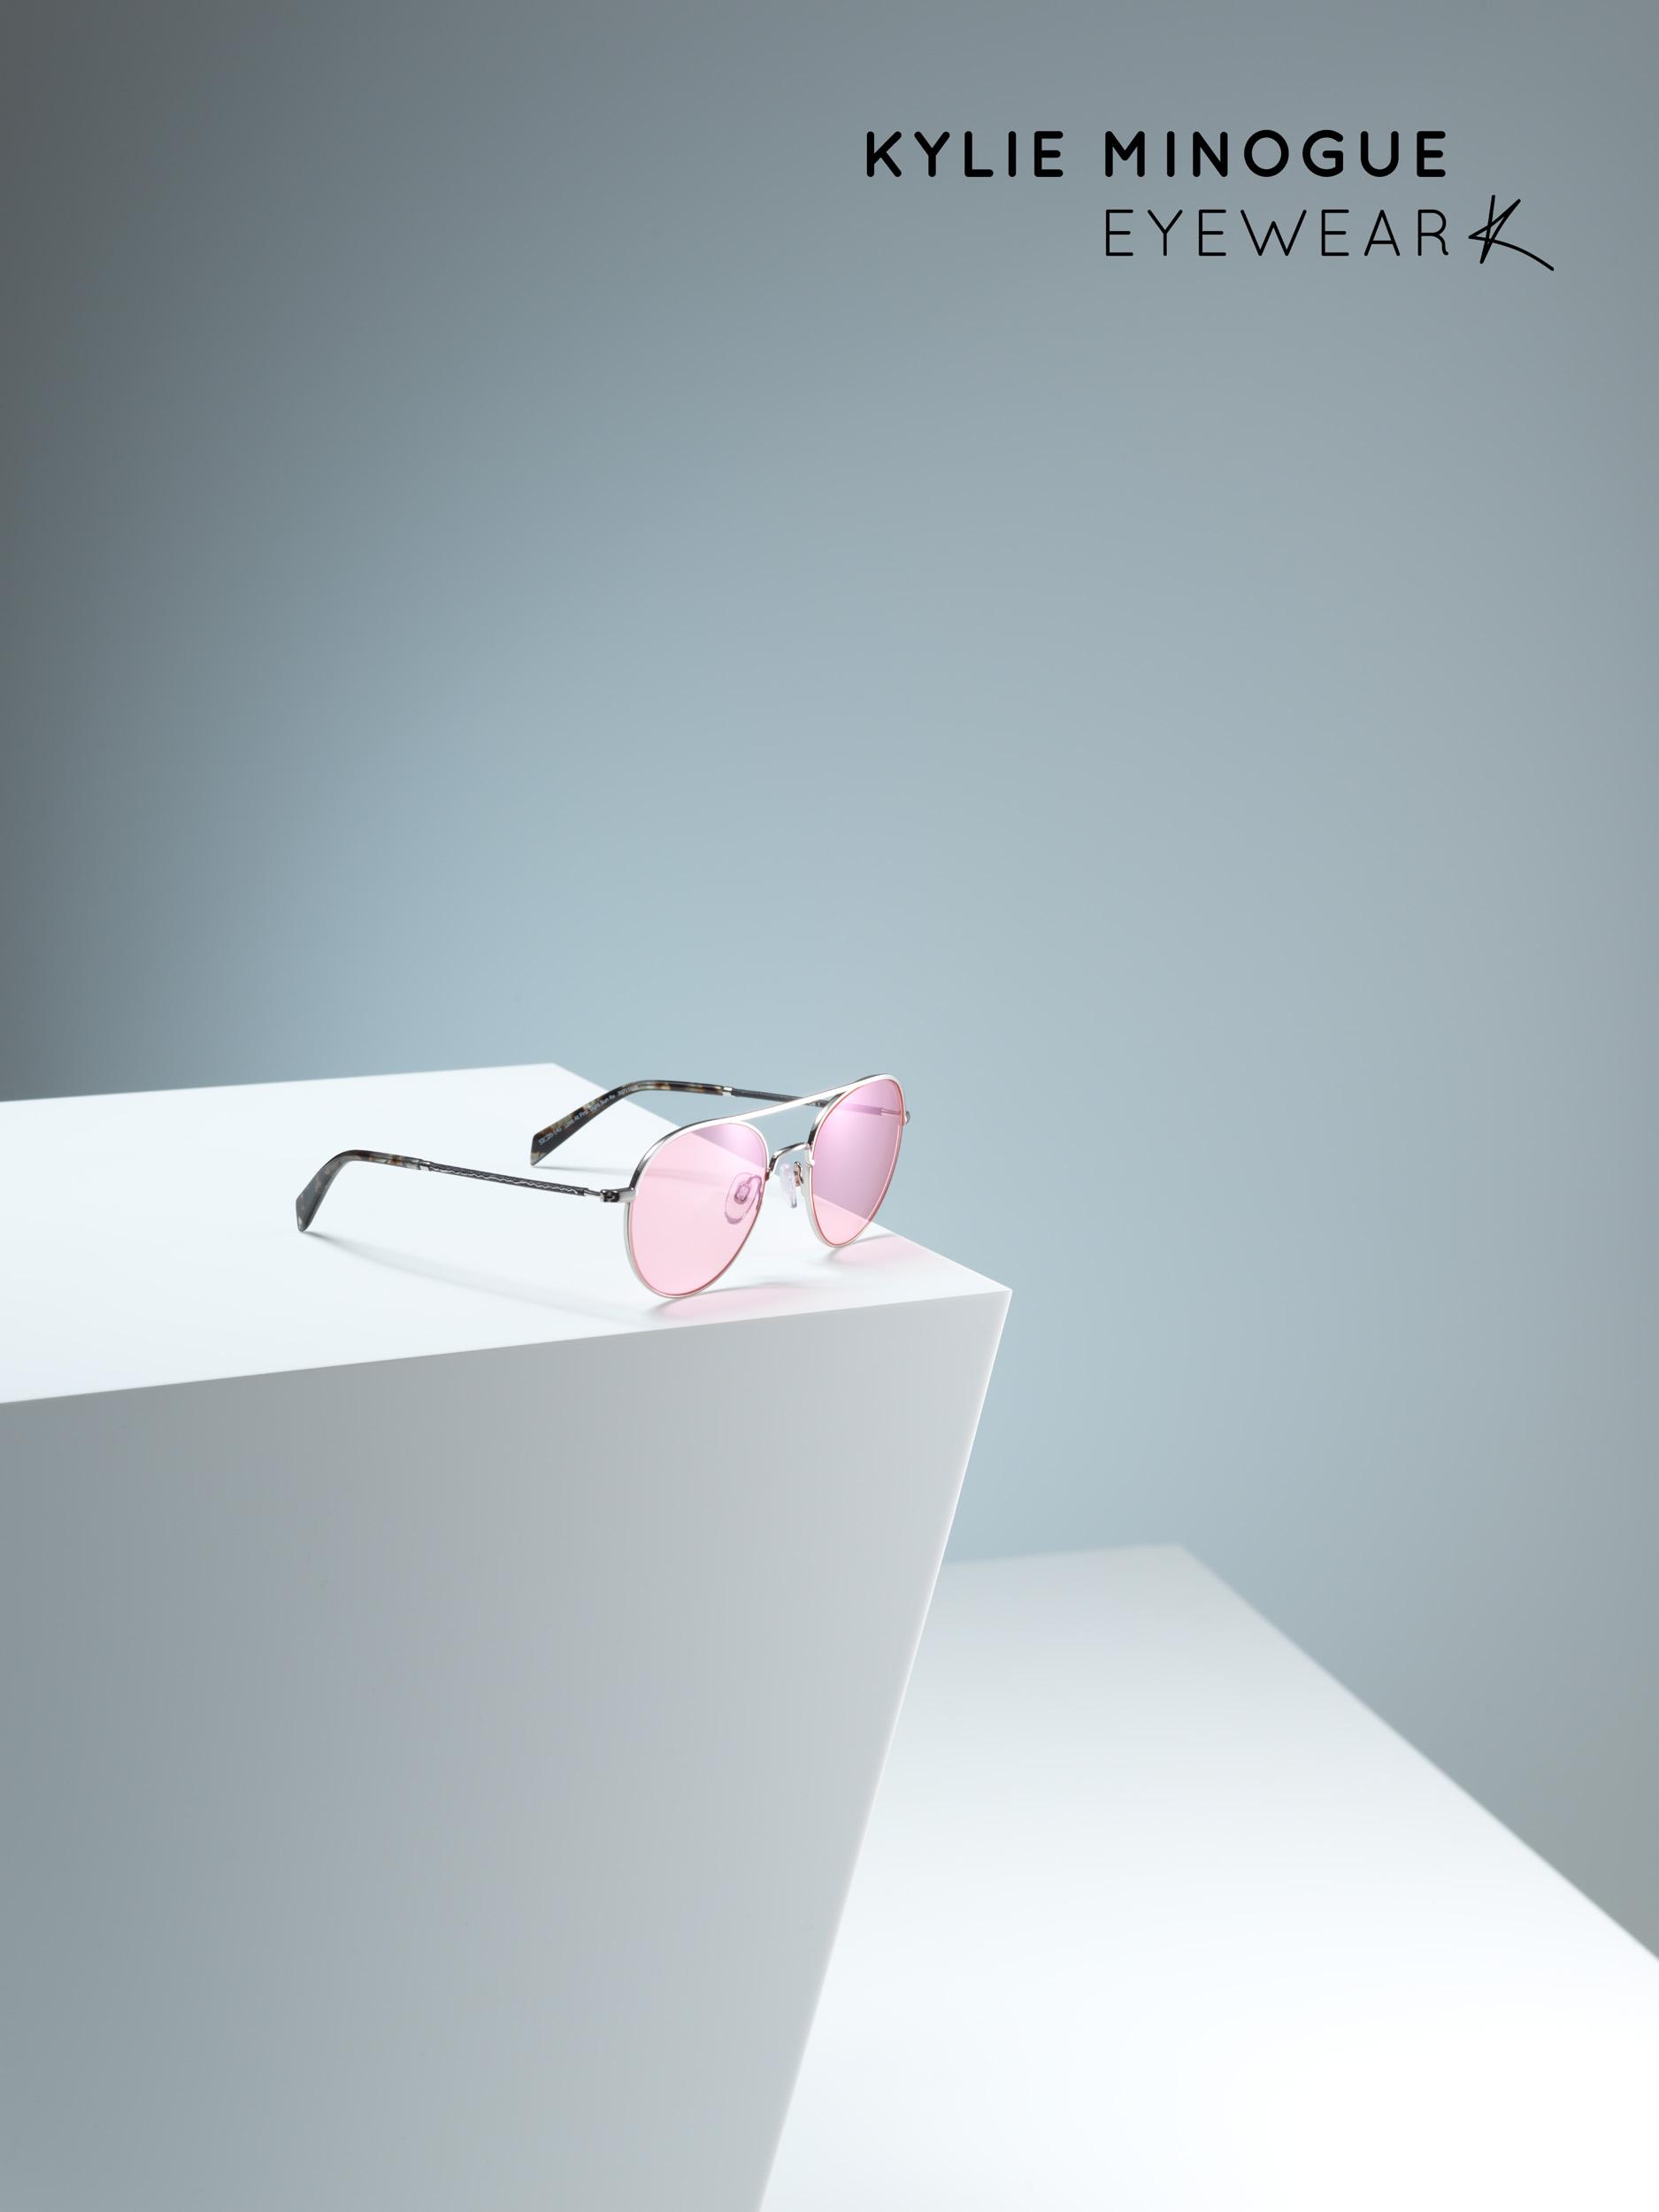 Kylie_eyewear.jpg